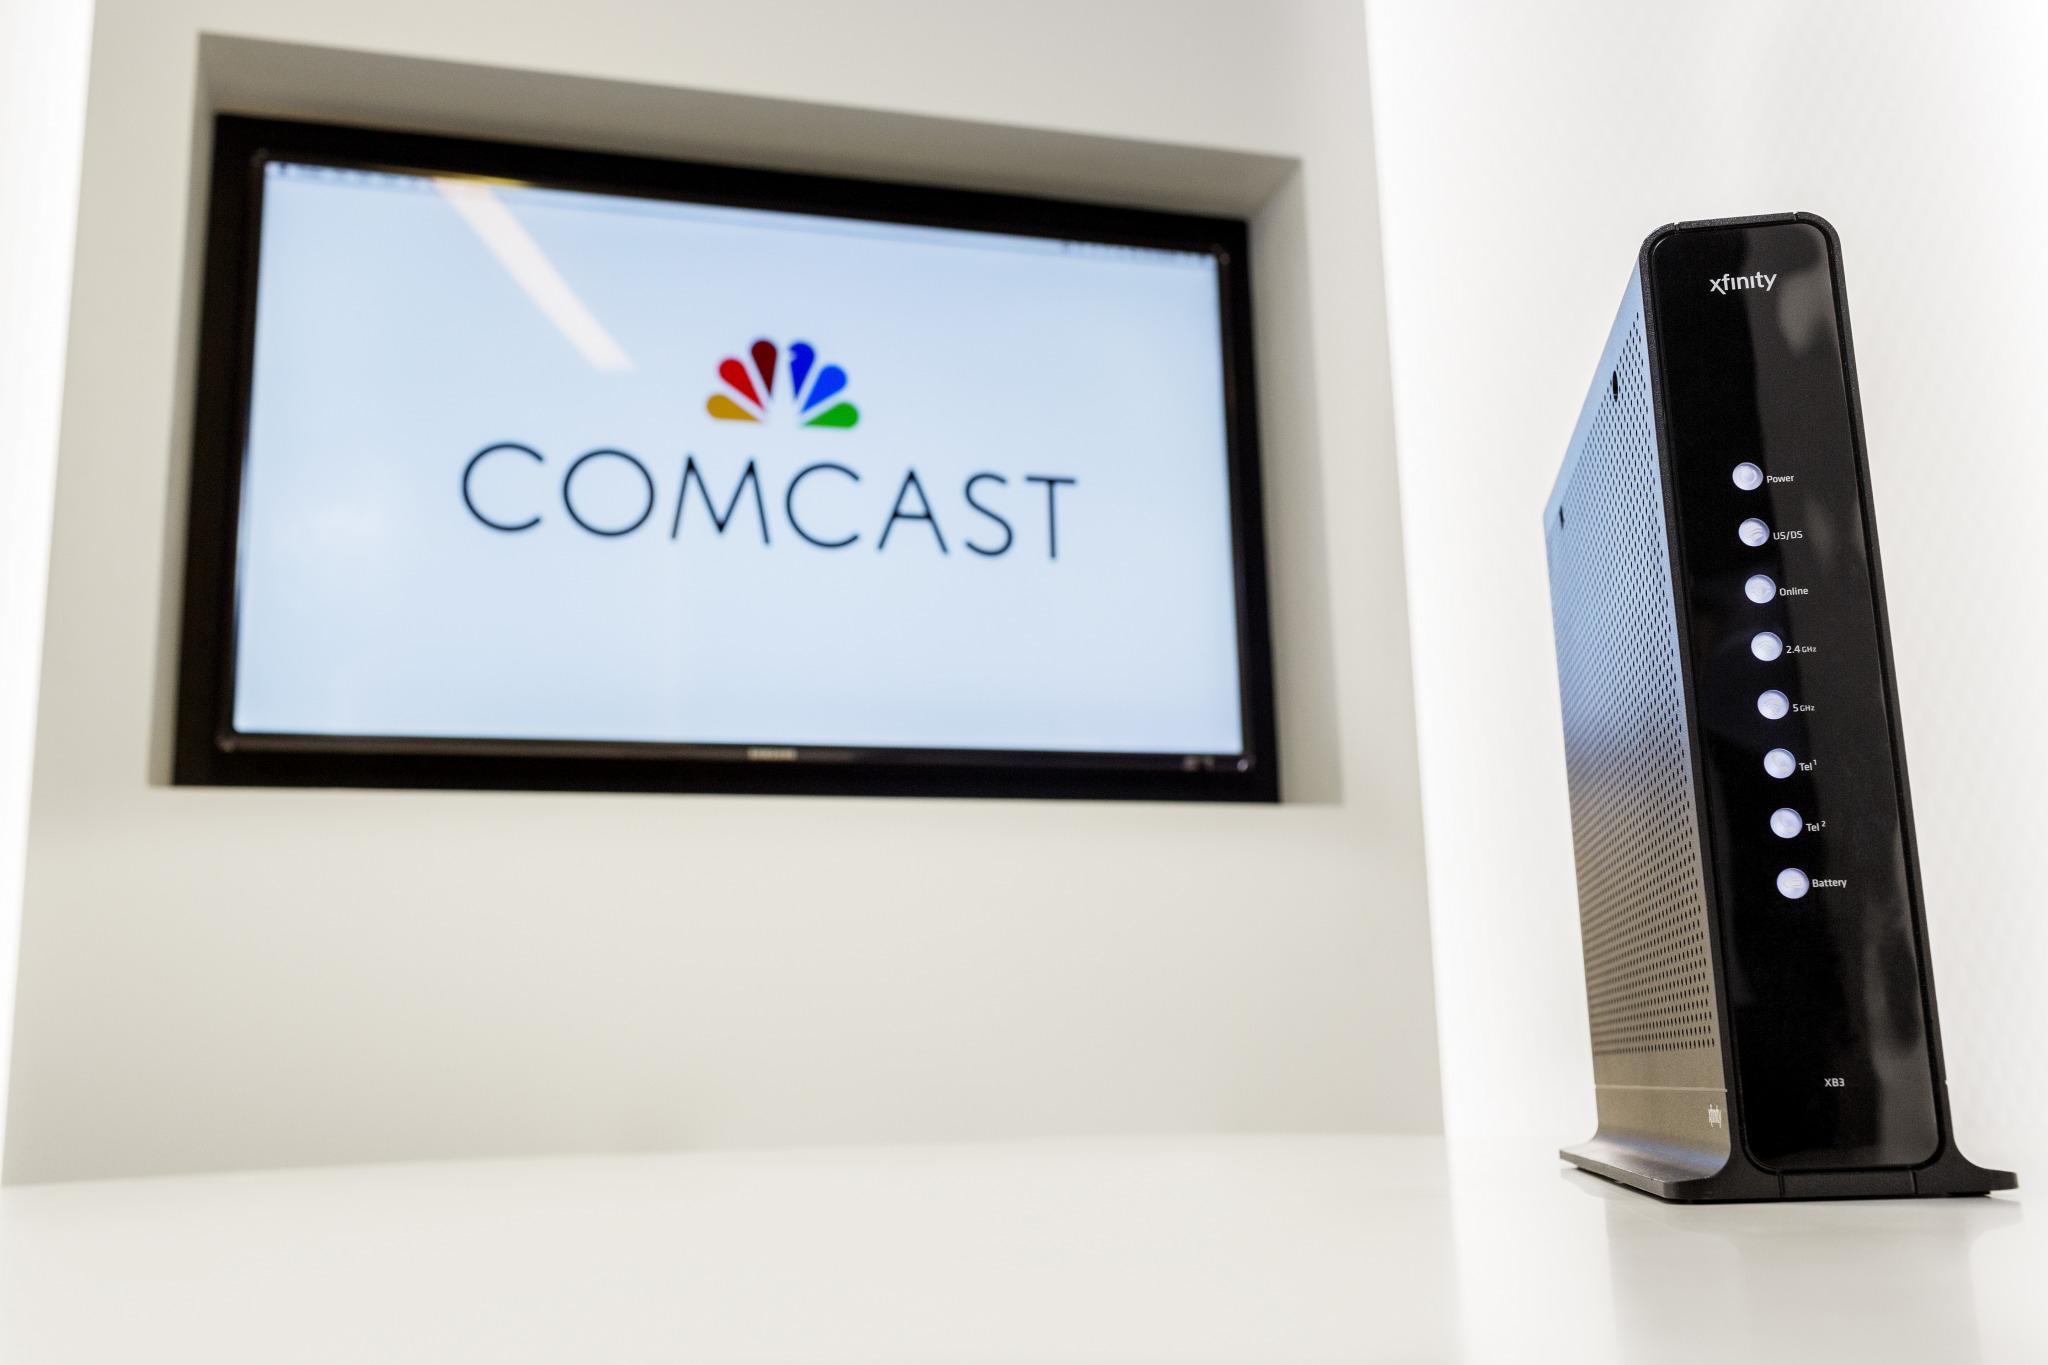 Comcast gateway